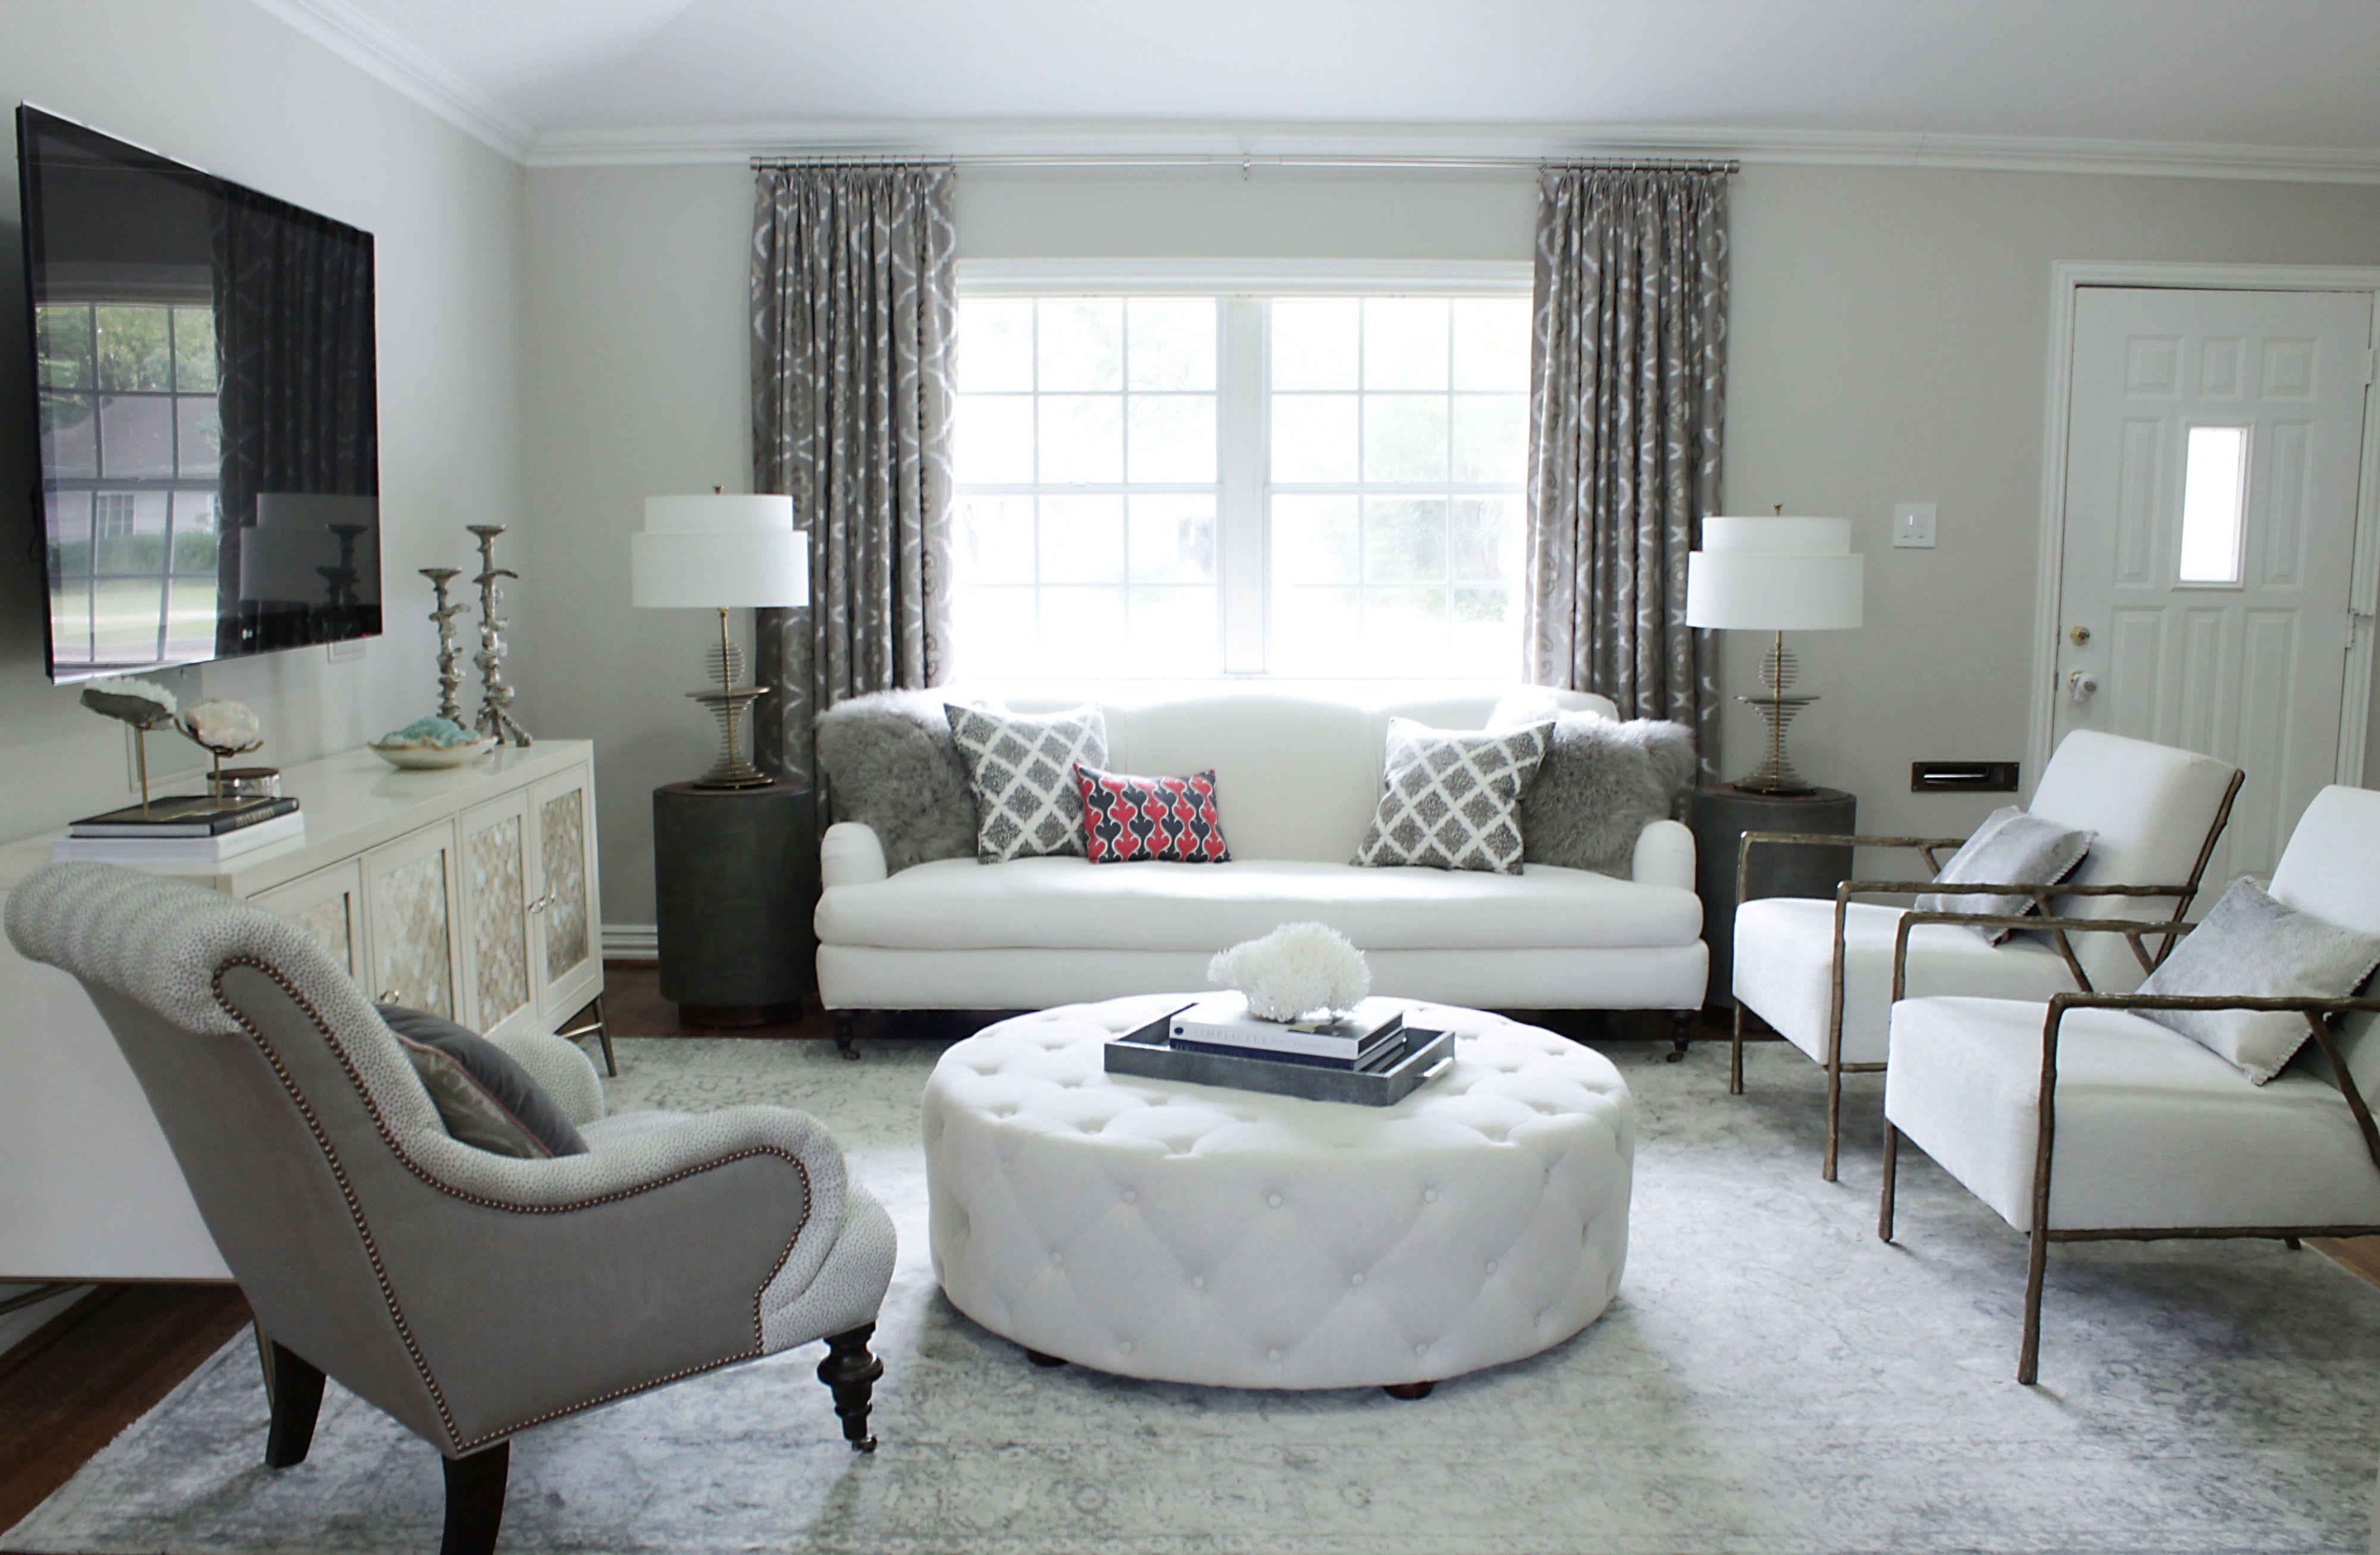 before \u0026, after an elegant, budget friendly living room makeoverbefore \u0026 after an elegant, budget friendly living room makeover